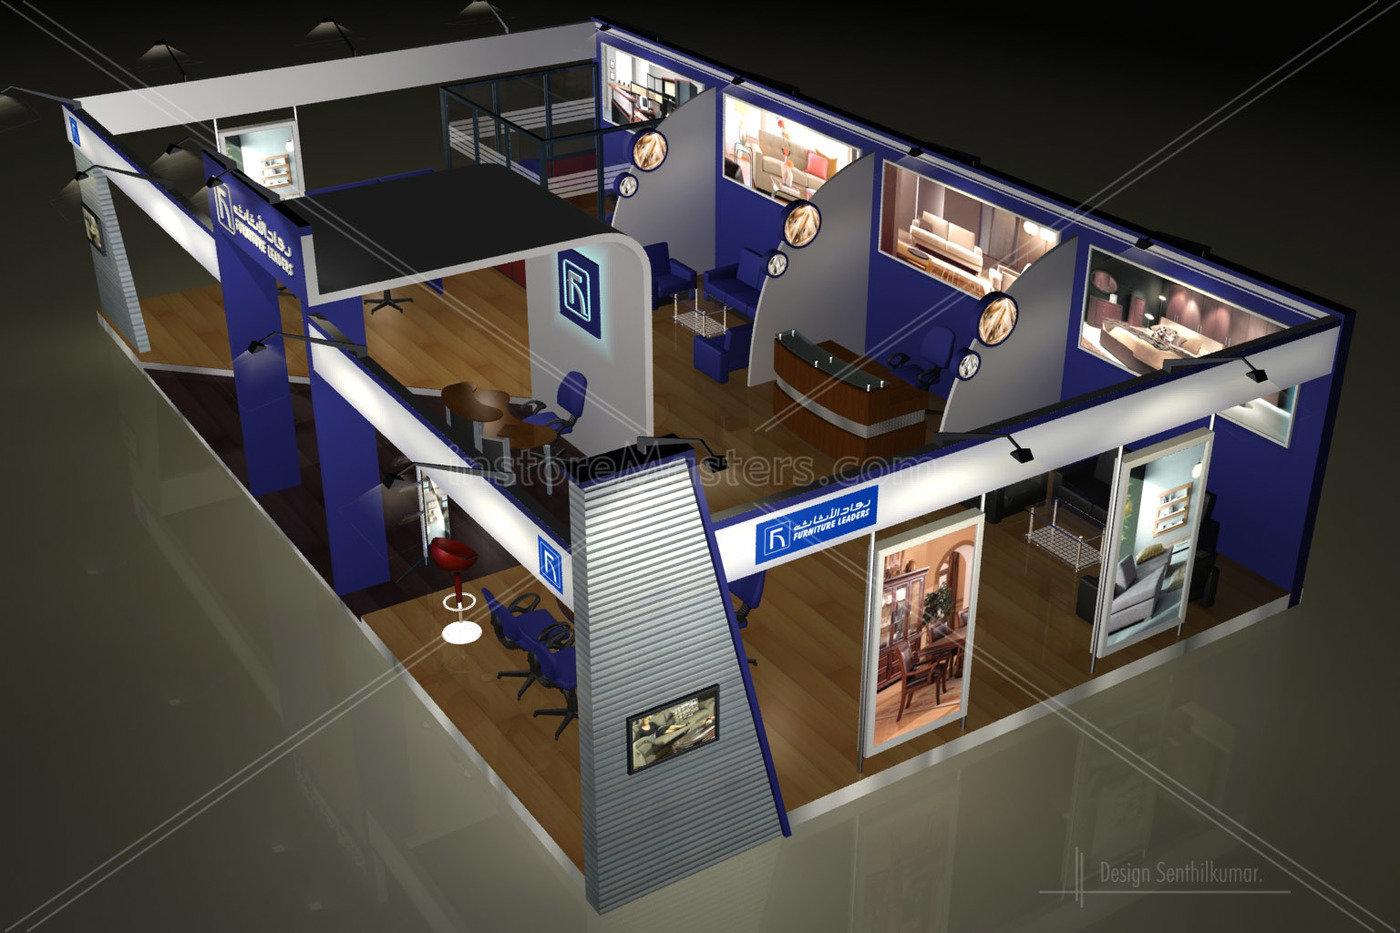 Exhibition Stand Design Furniture : Exhibition stand design by senthil kumar at coroflot